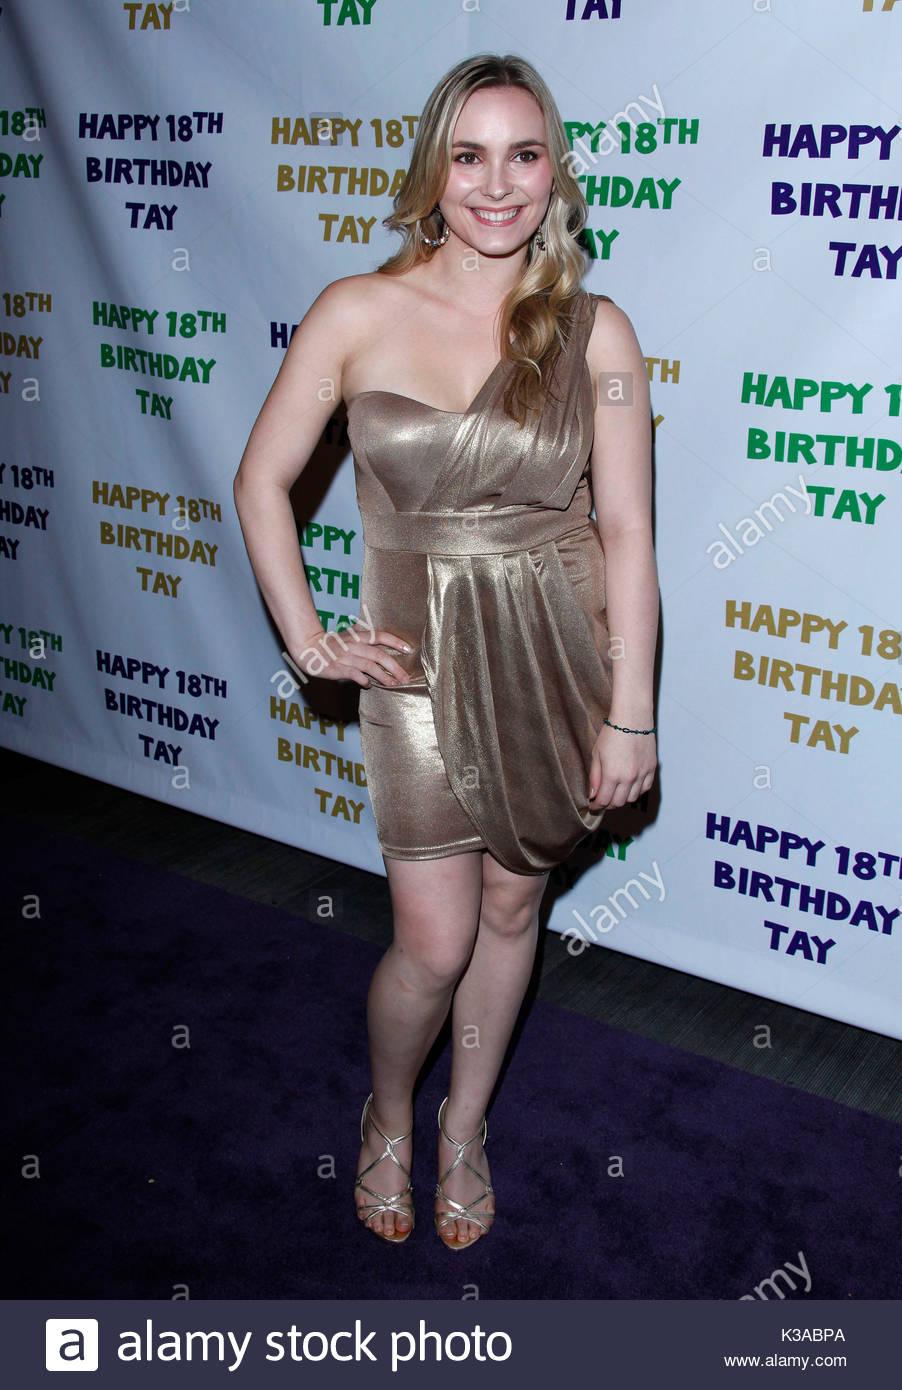 Amy Castle nudes (77 photos), video Bikini, YouTube, lingerie 2015